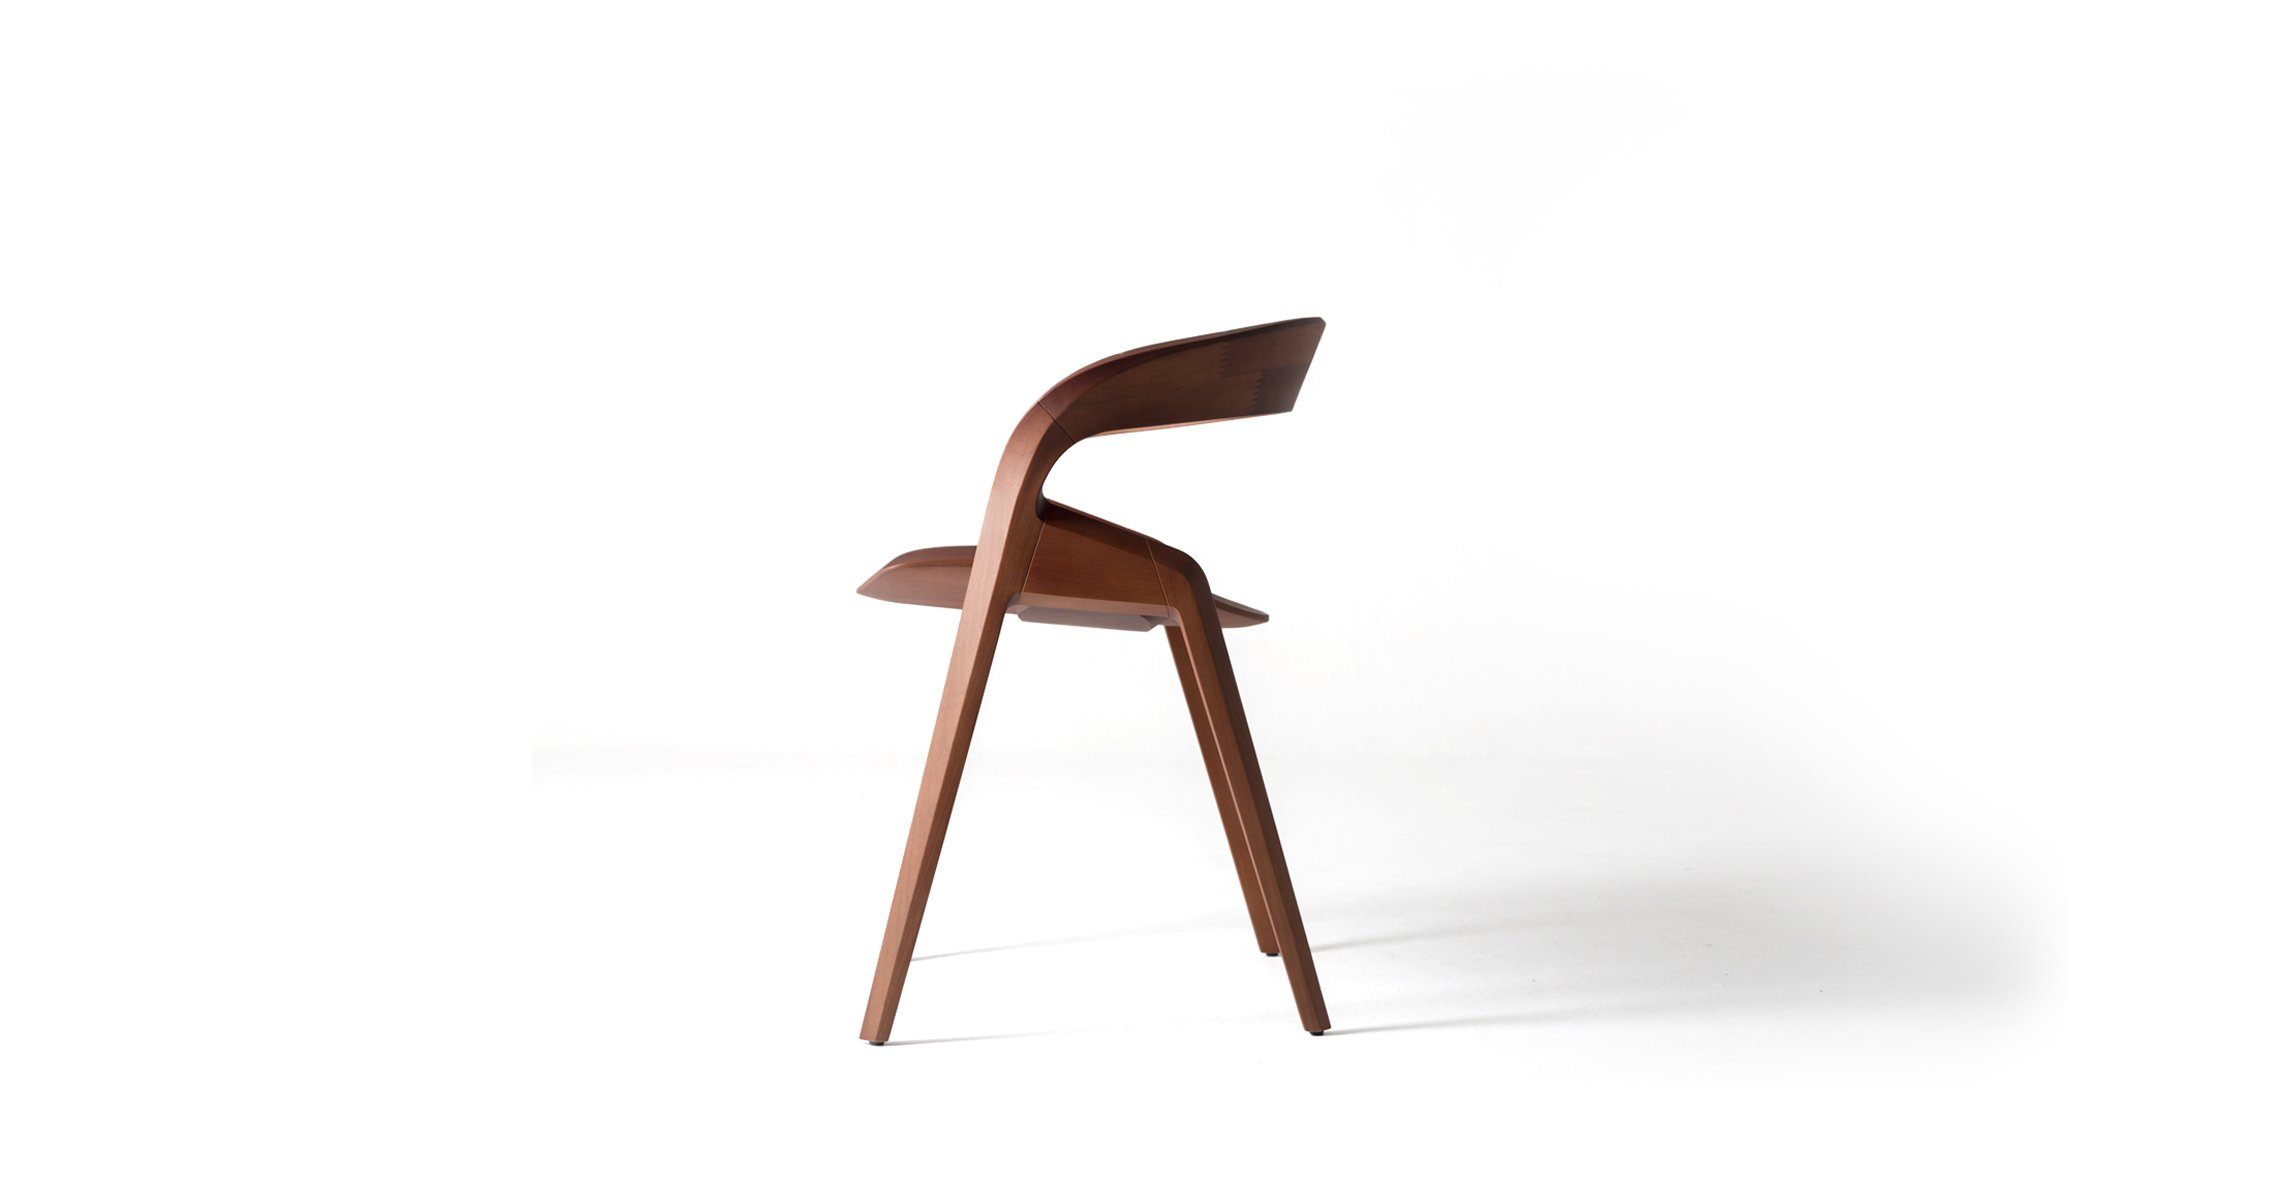 [Cadeira Pris] Fullbanner 1